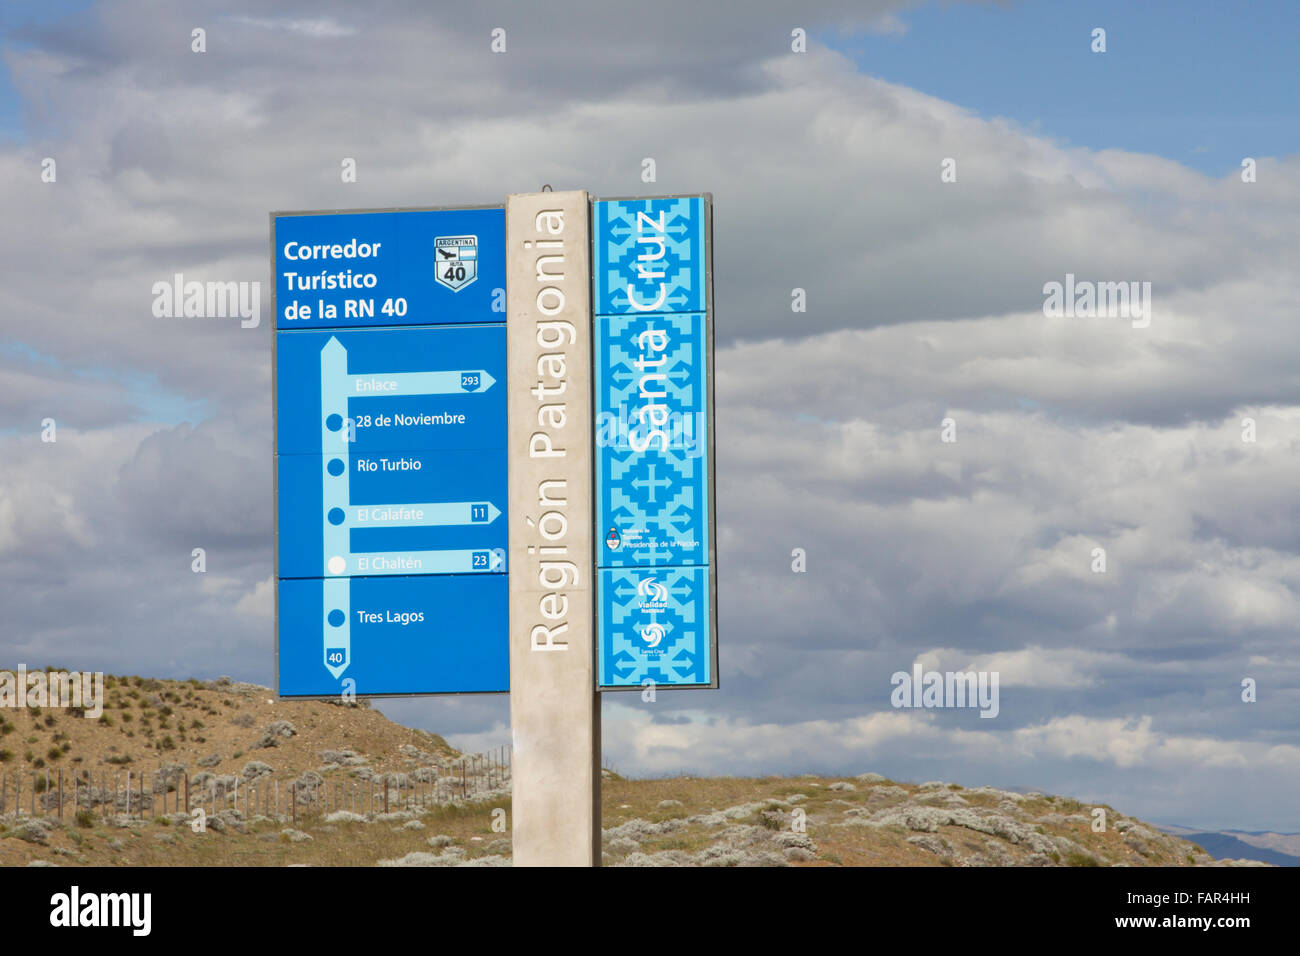 Santa Cruz, Argentina - December 3, 2015 :  Roadway sign for historic Route 40 in Patagonia, Argentina. - Stock Image